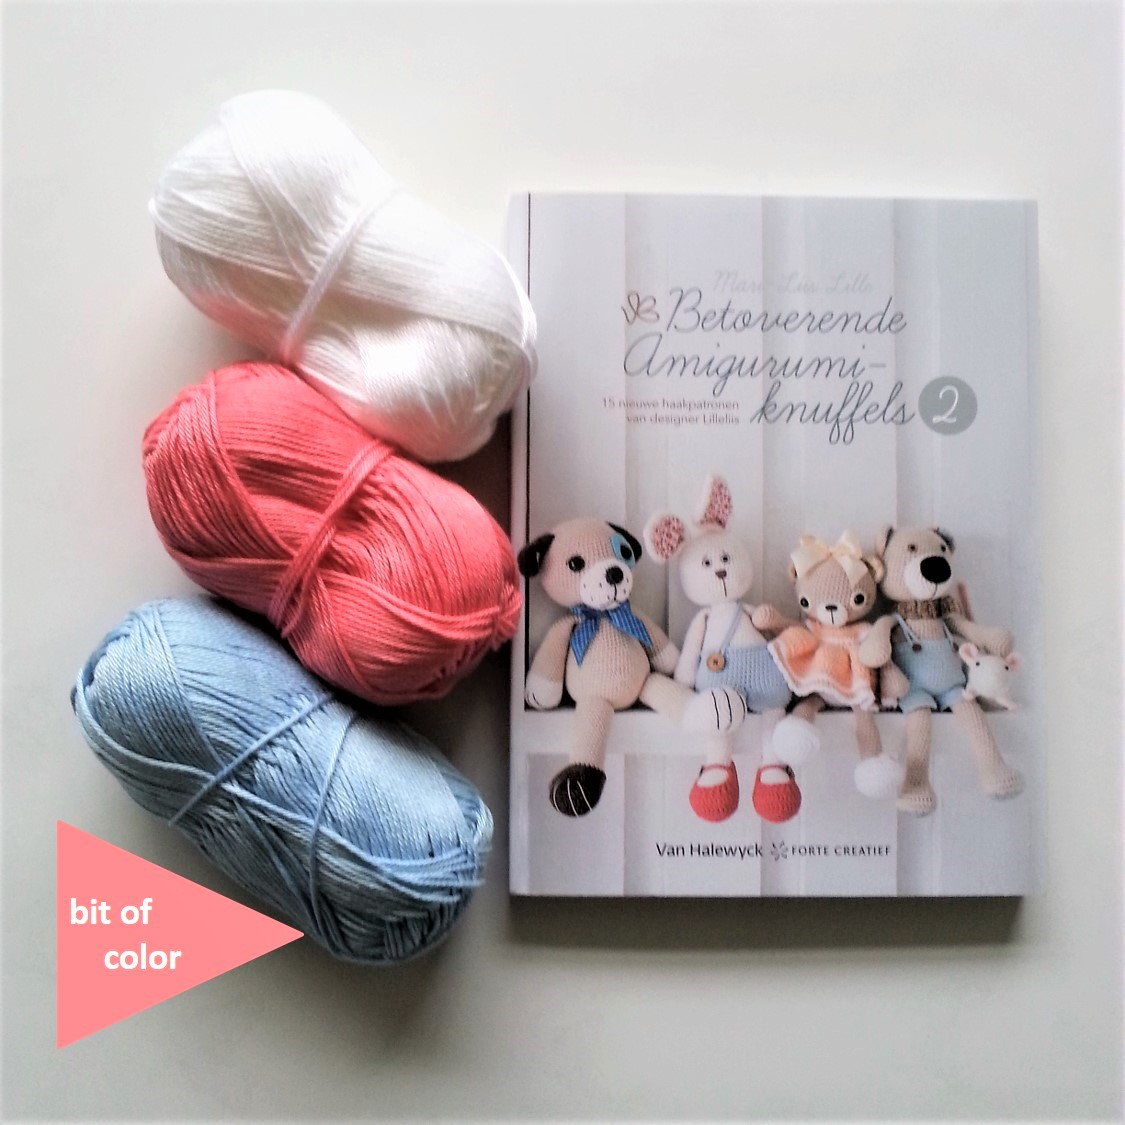 Christels knuffels 2 - Hobbydoos.nl | 1125x1125